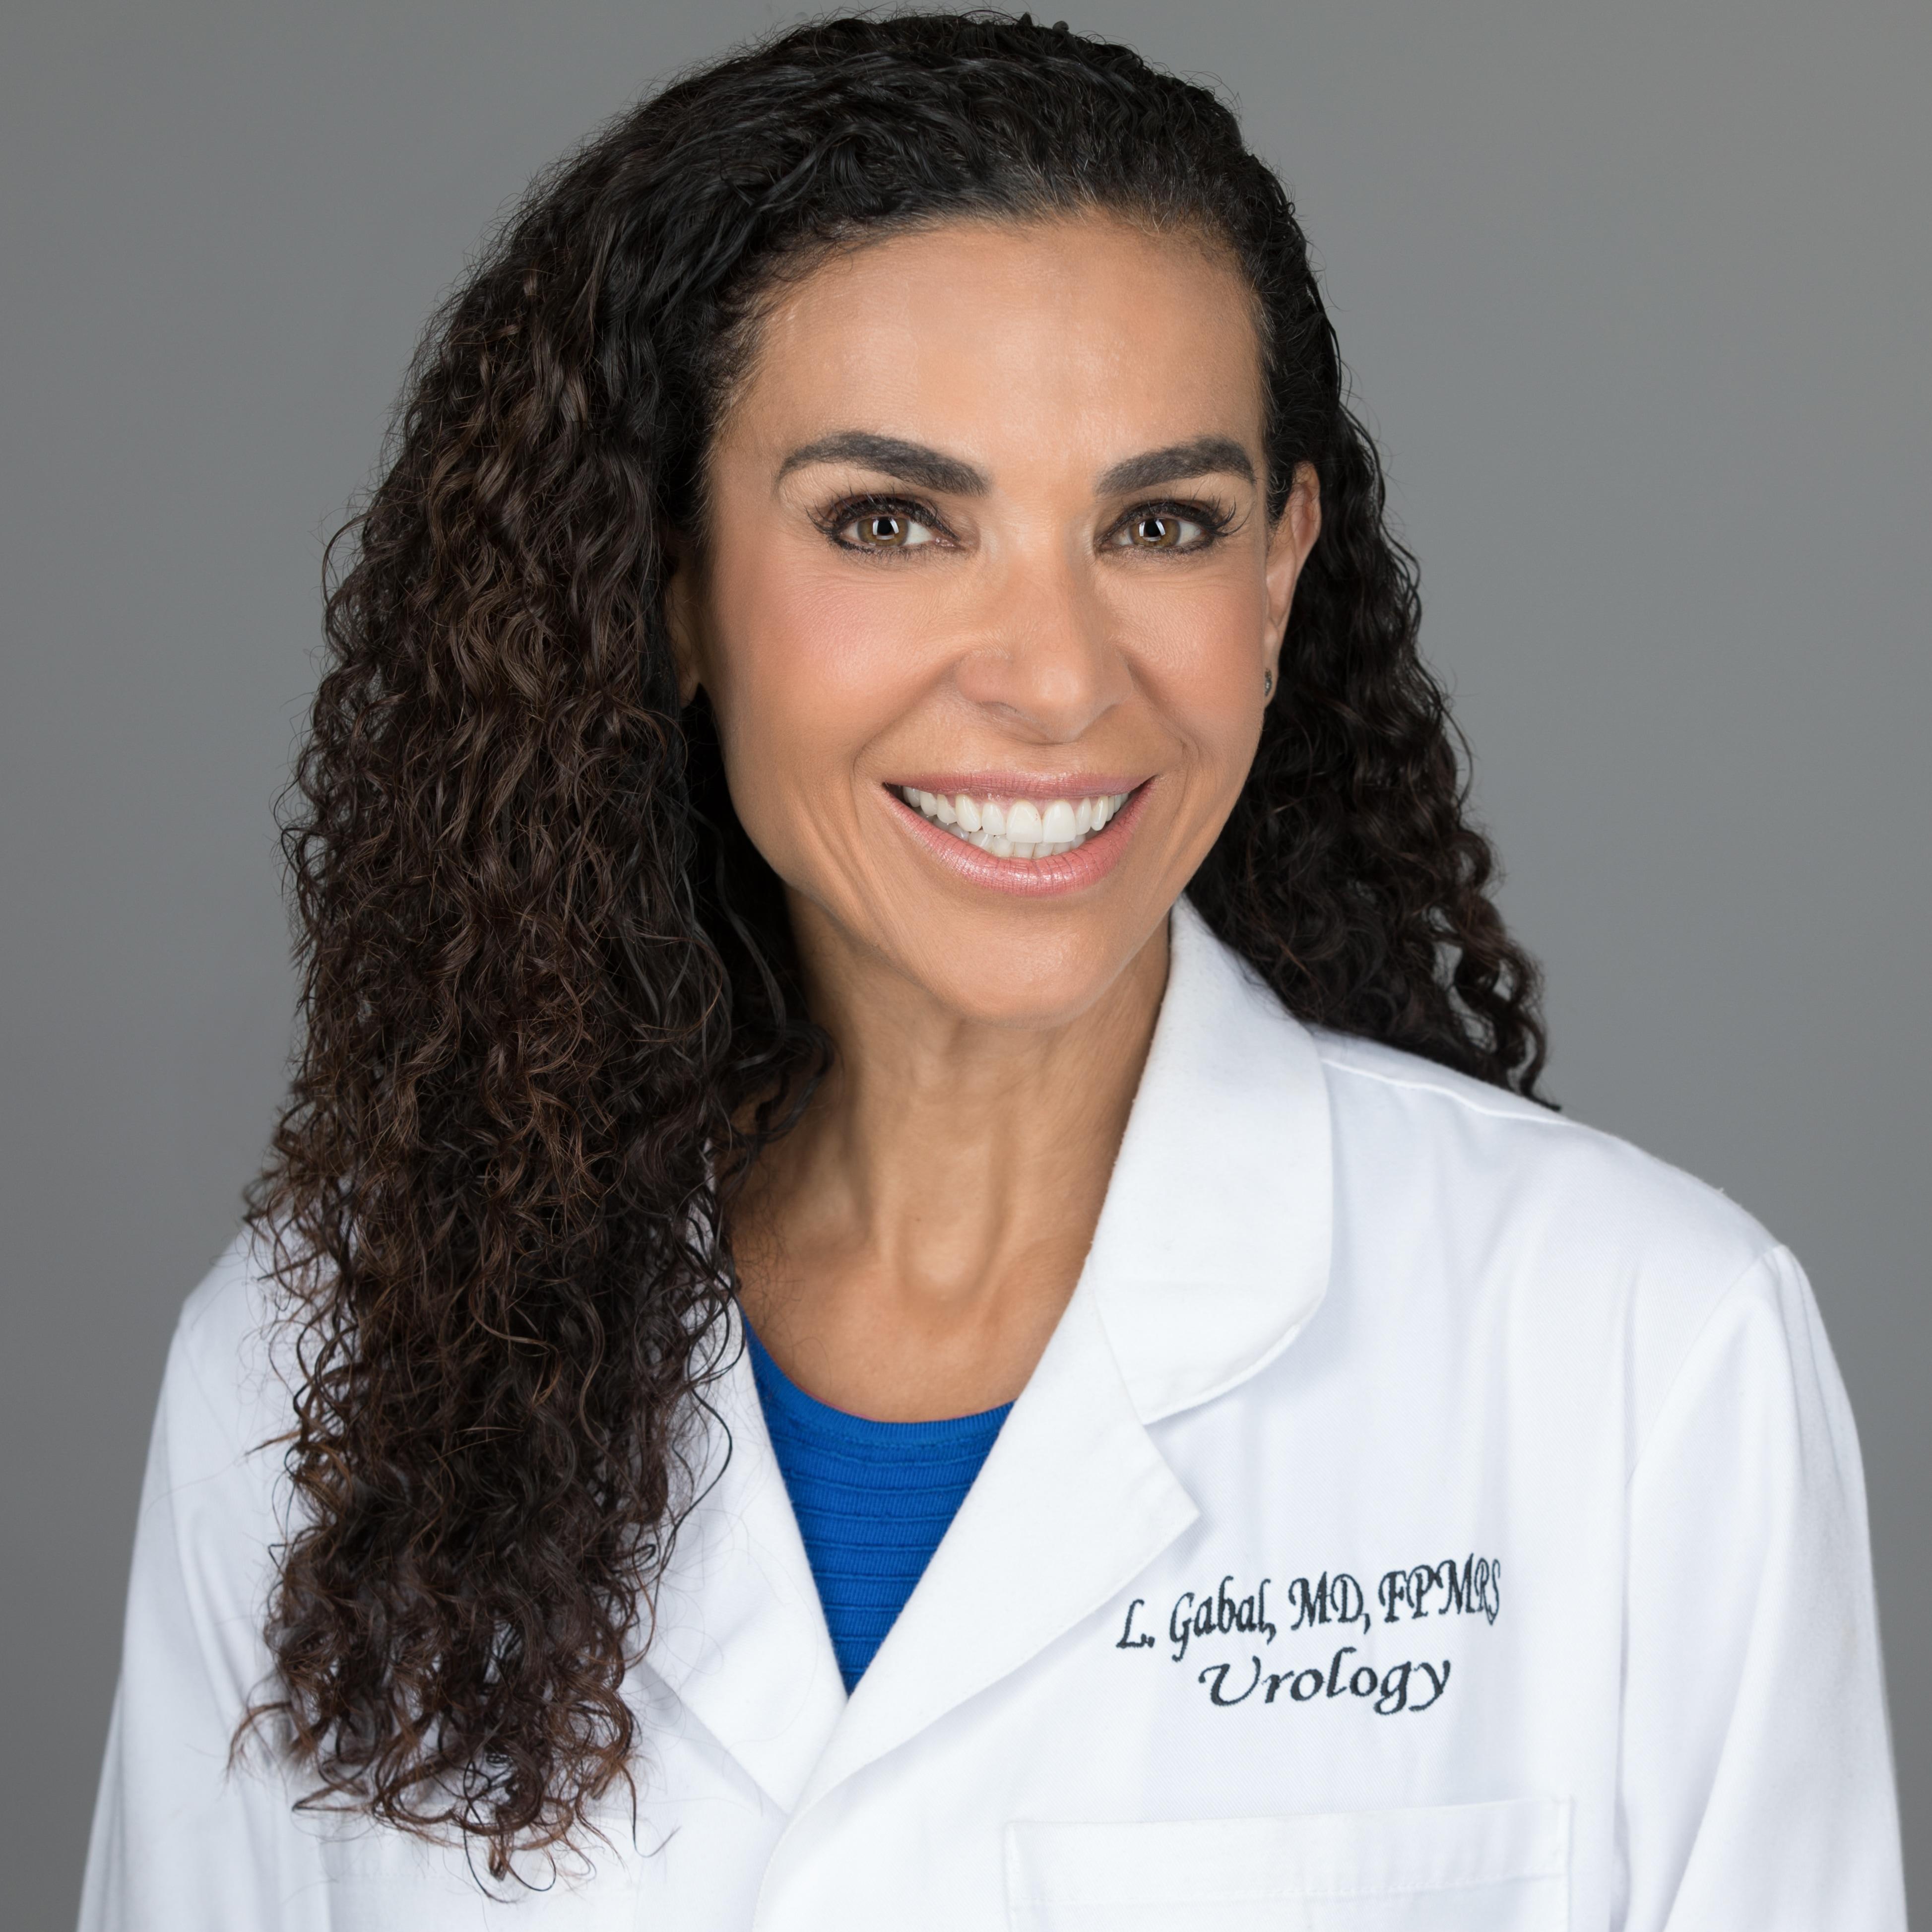 Lamia Gabal Reviews | Santa Ana, CA | Vitals com